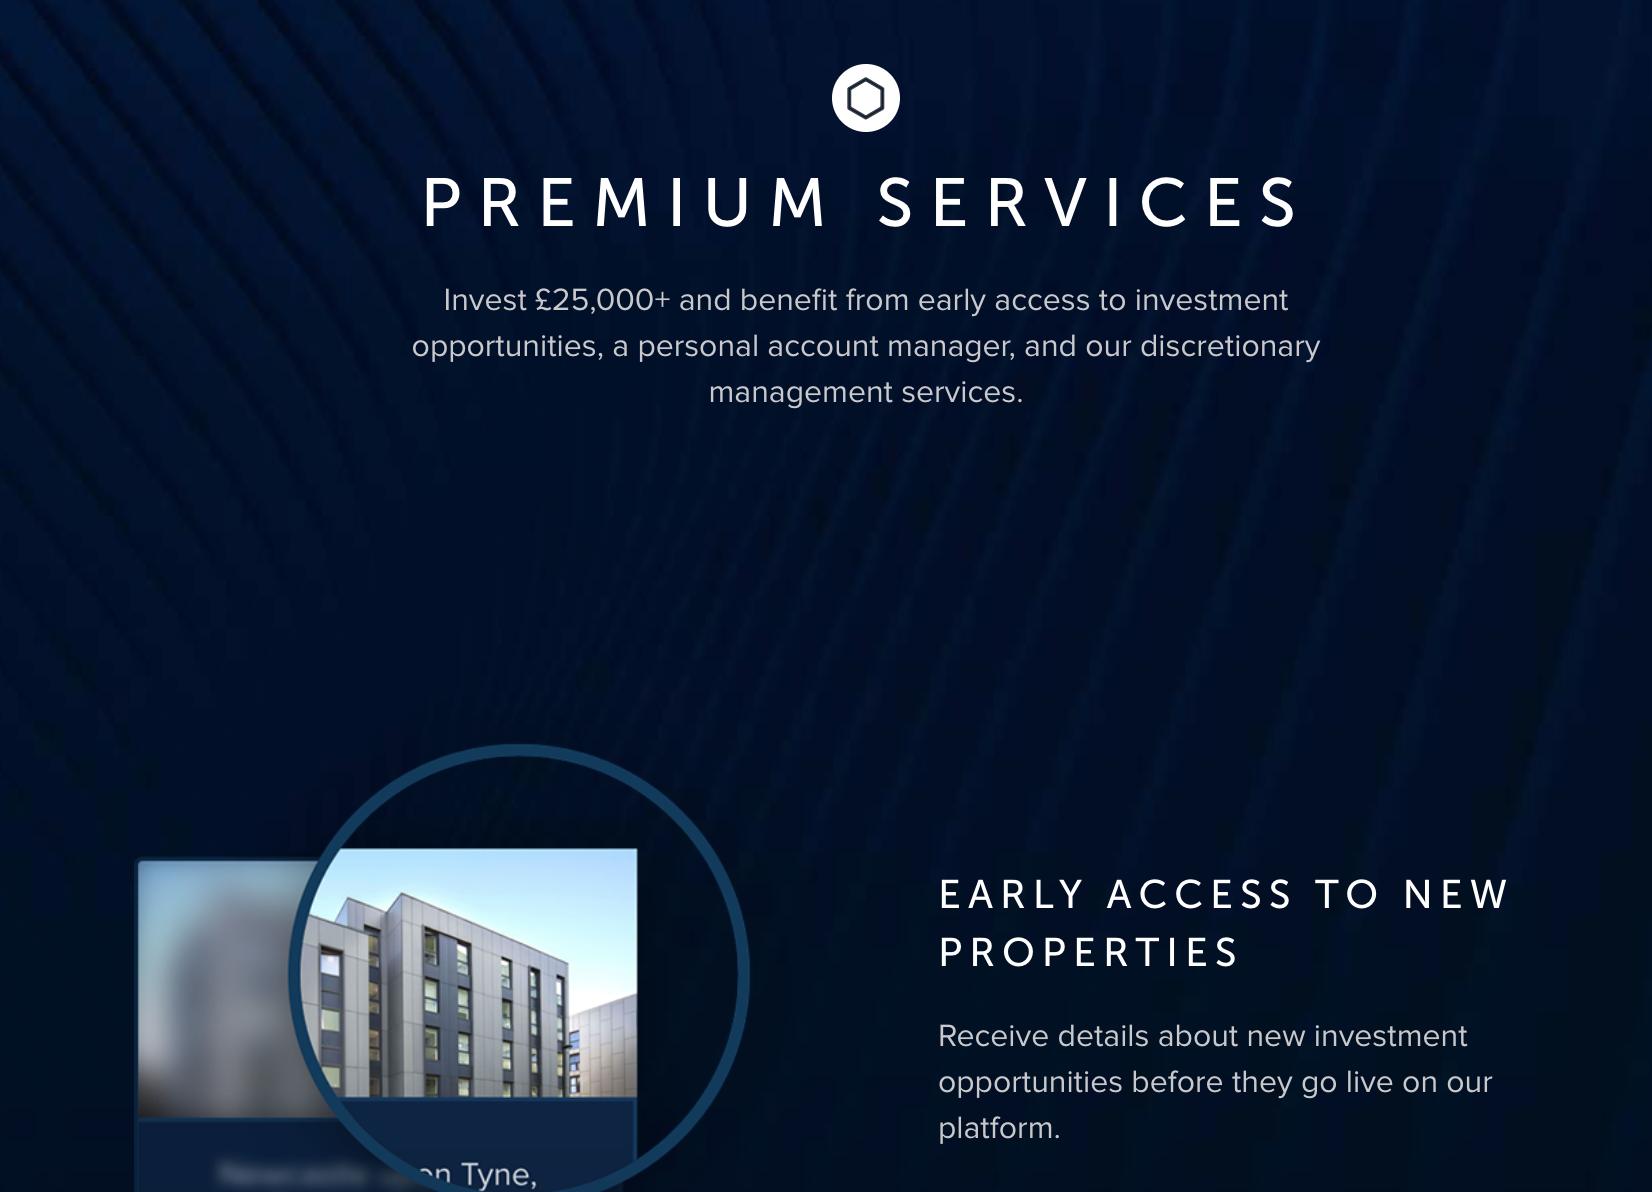 Premium service property partner